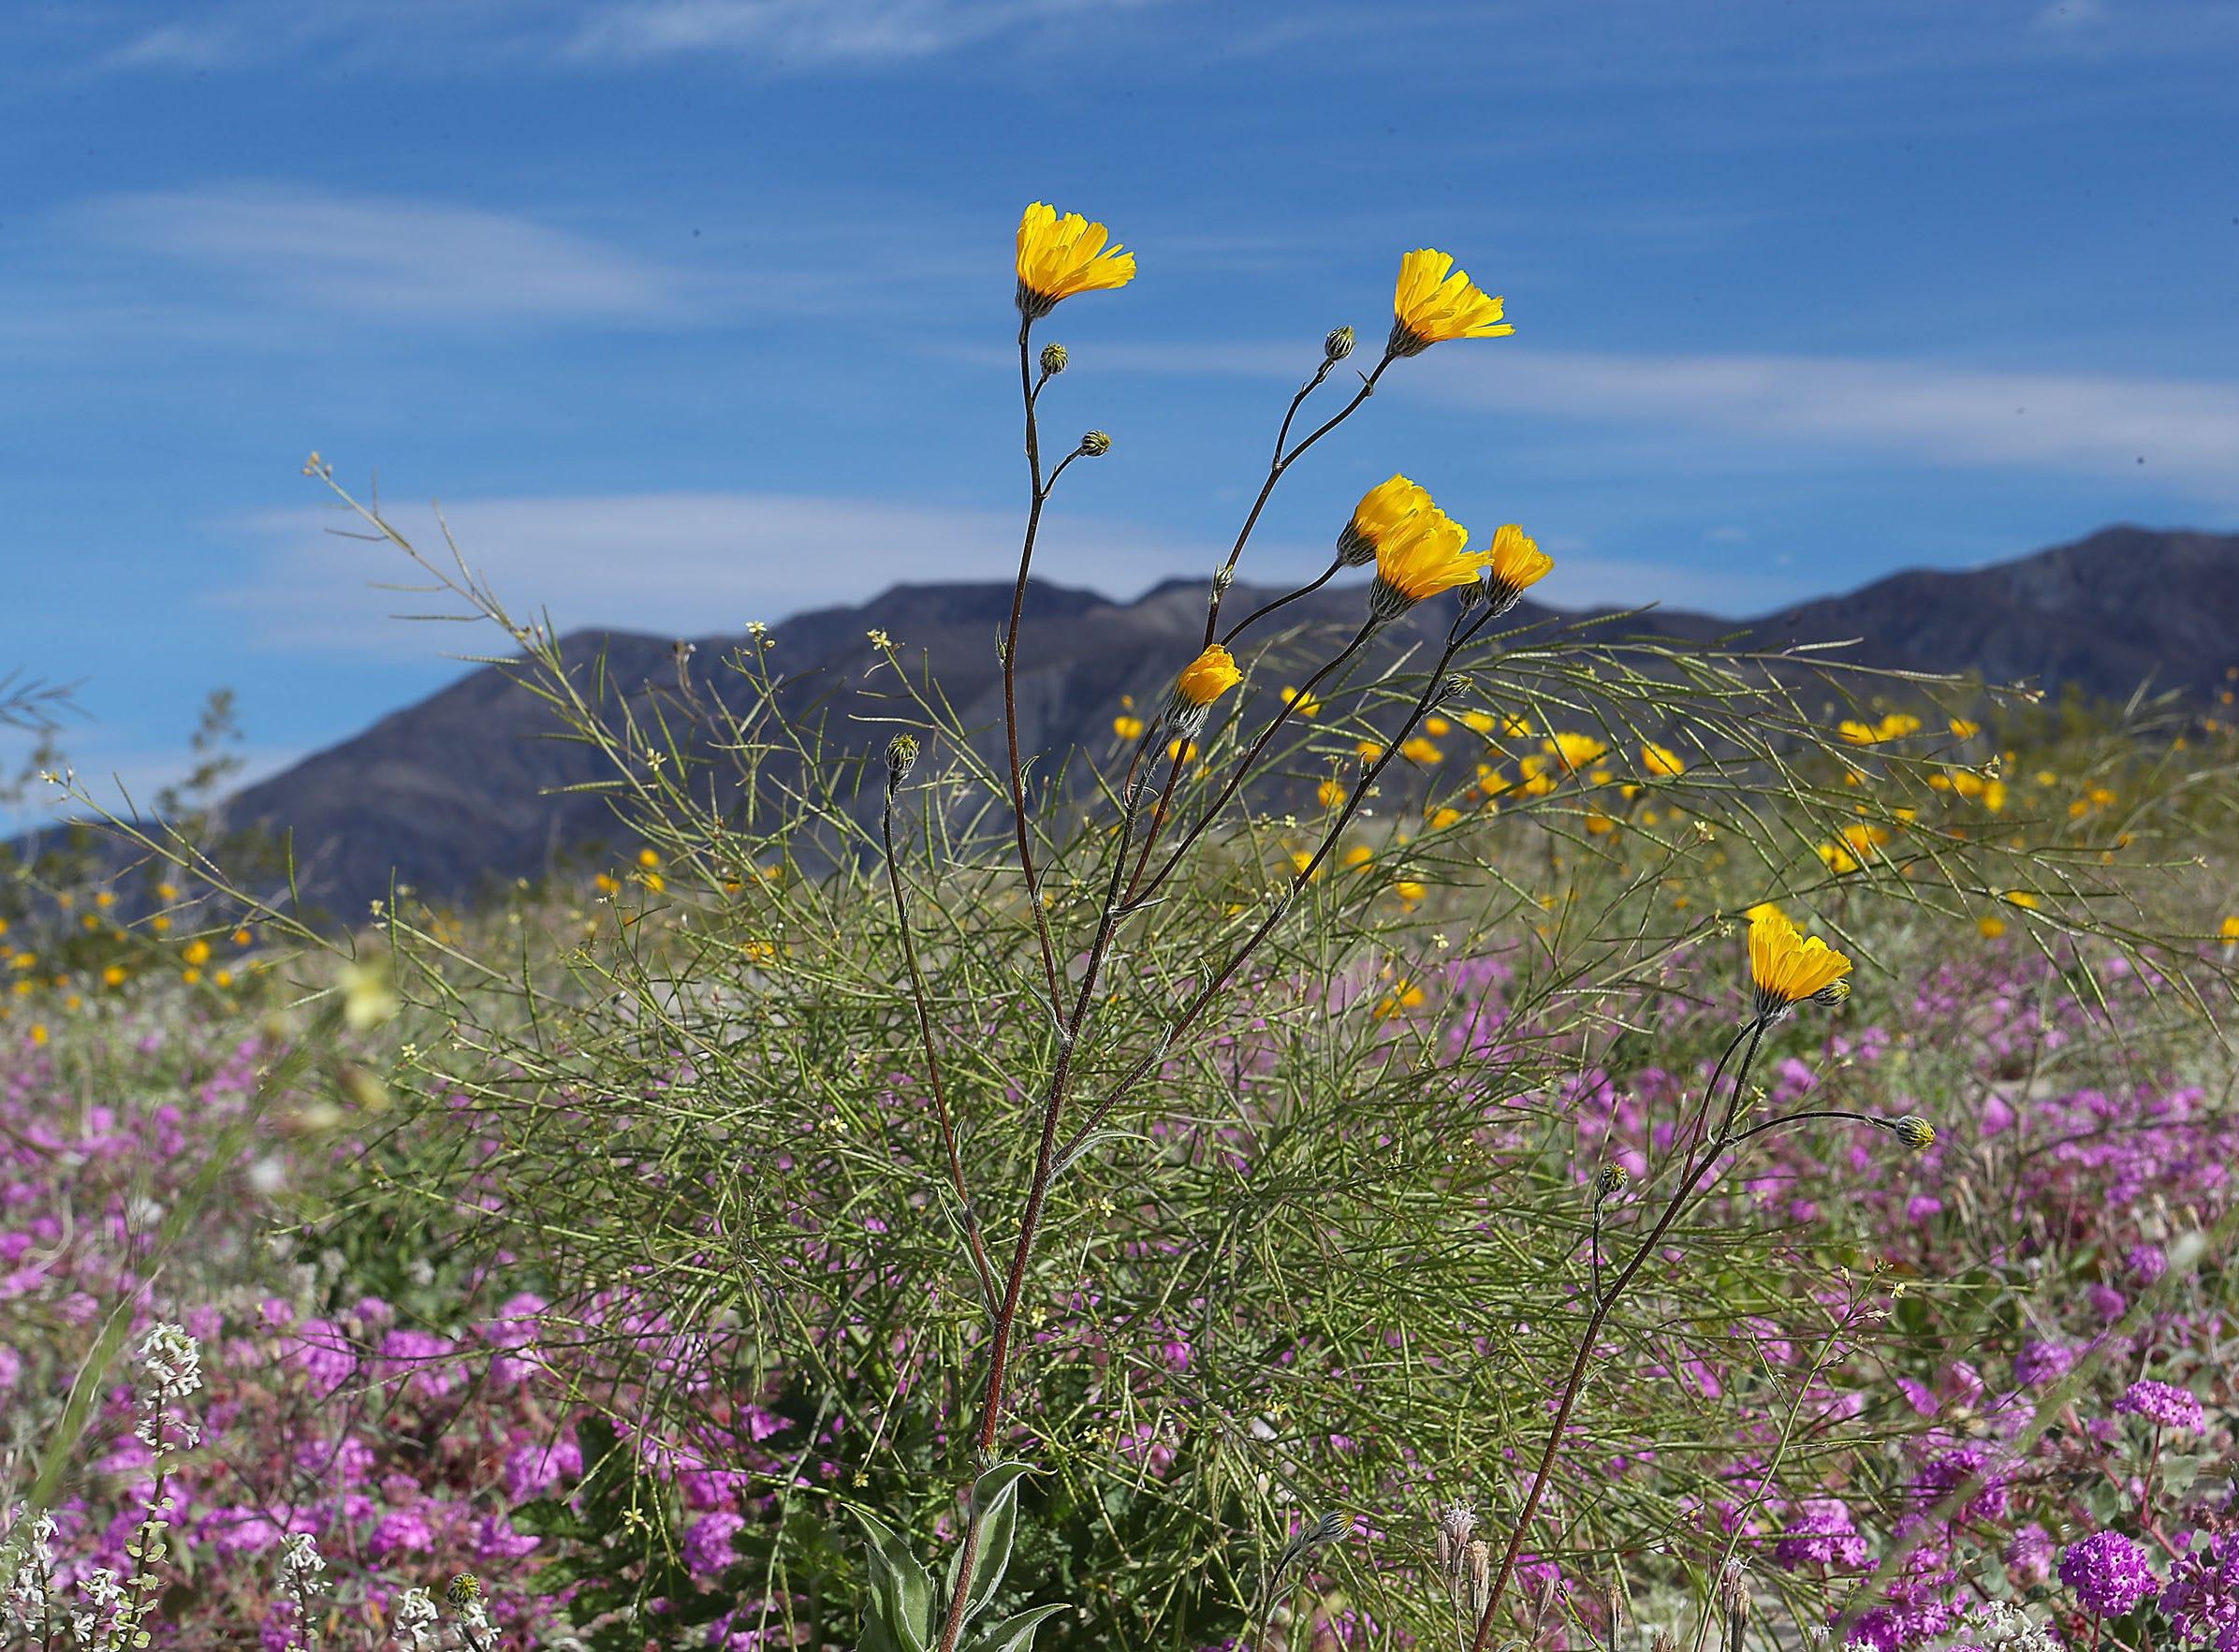 Wildflowers bloom in the Anza Borrego Desert State Park near Borrego Springs, California, March 1, 2019.